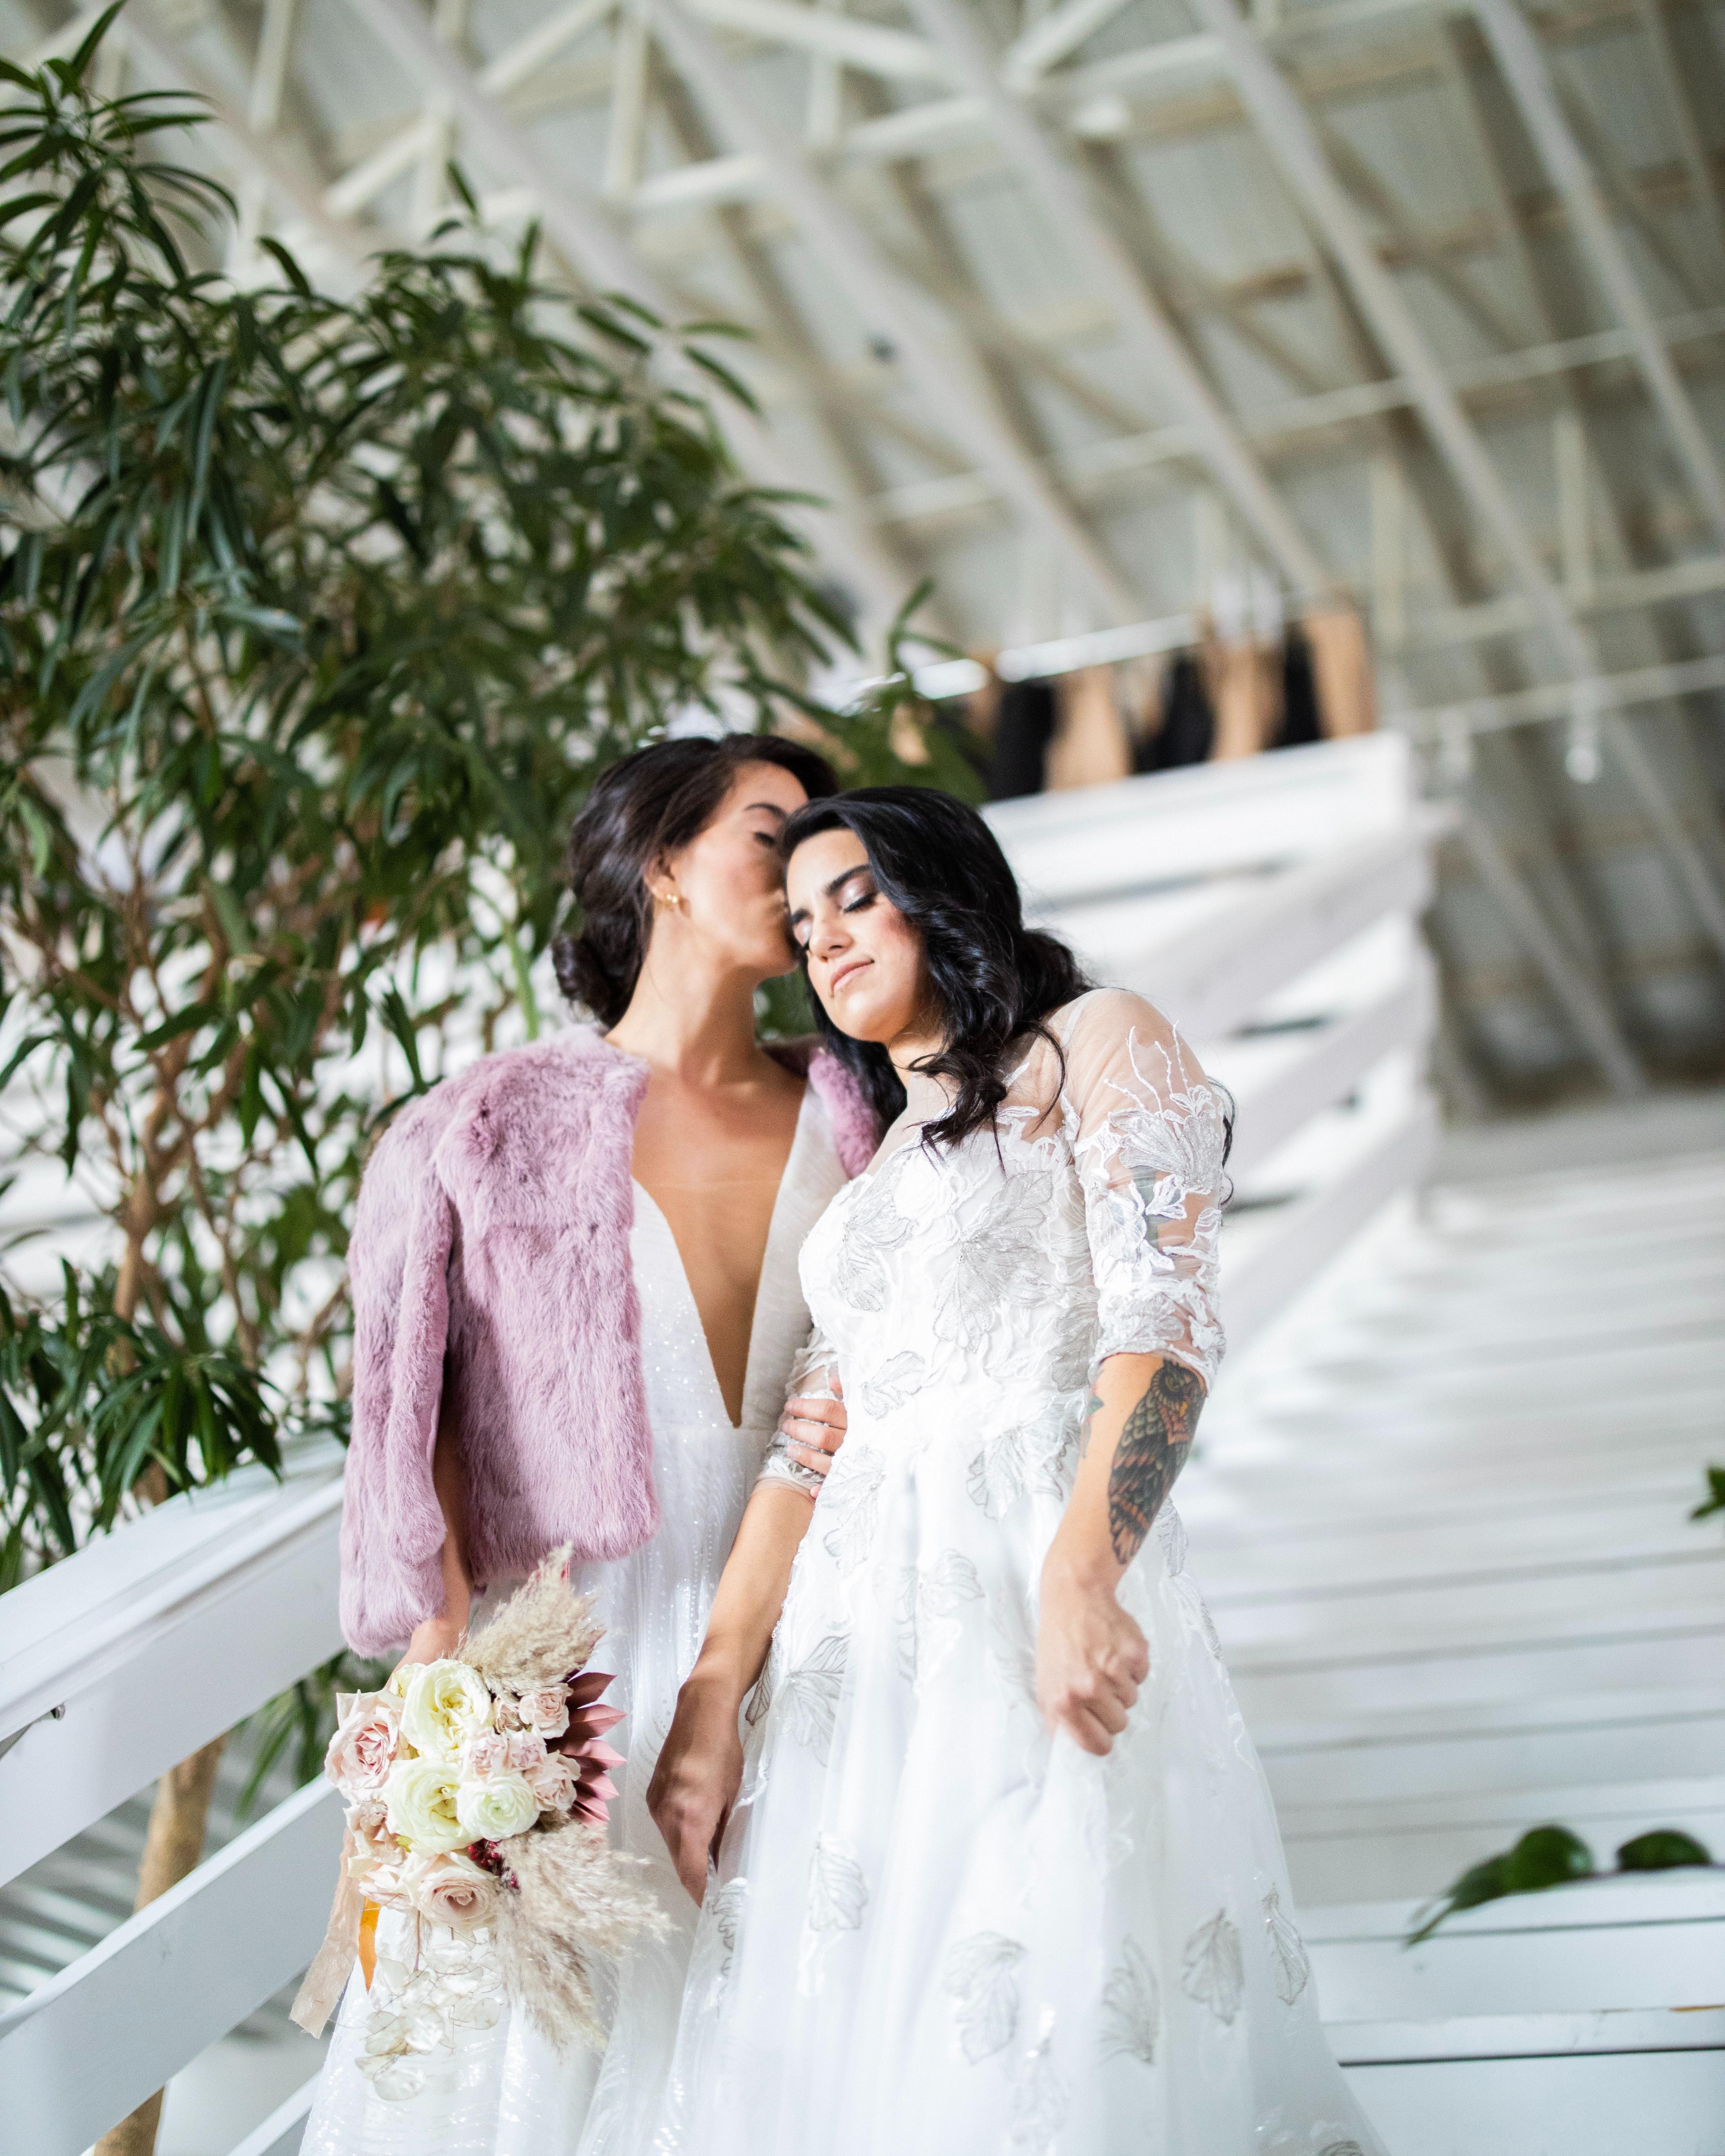 two-women-standing-on-stairway-near-plan